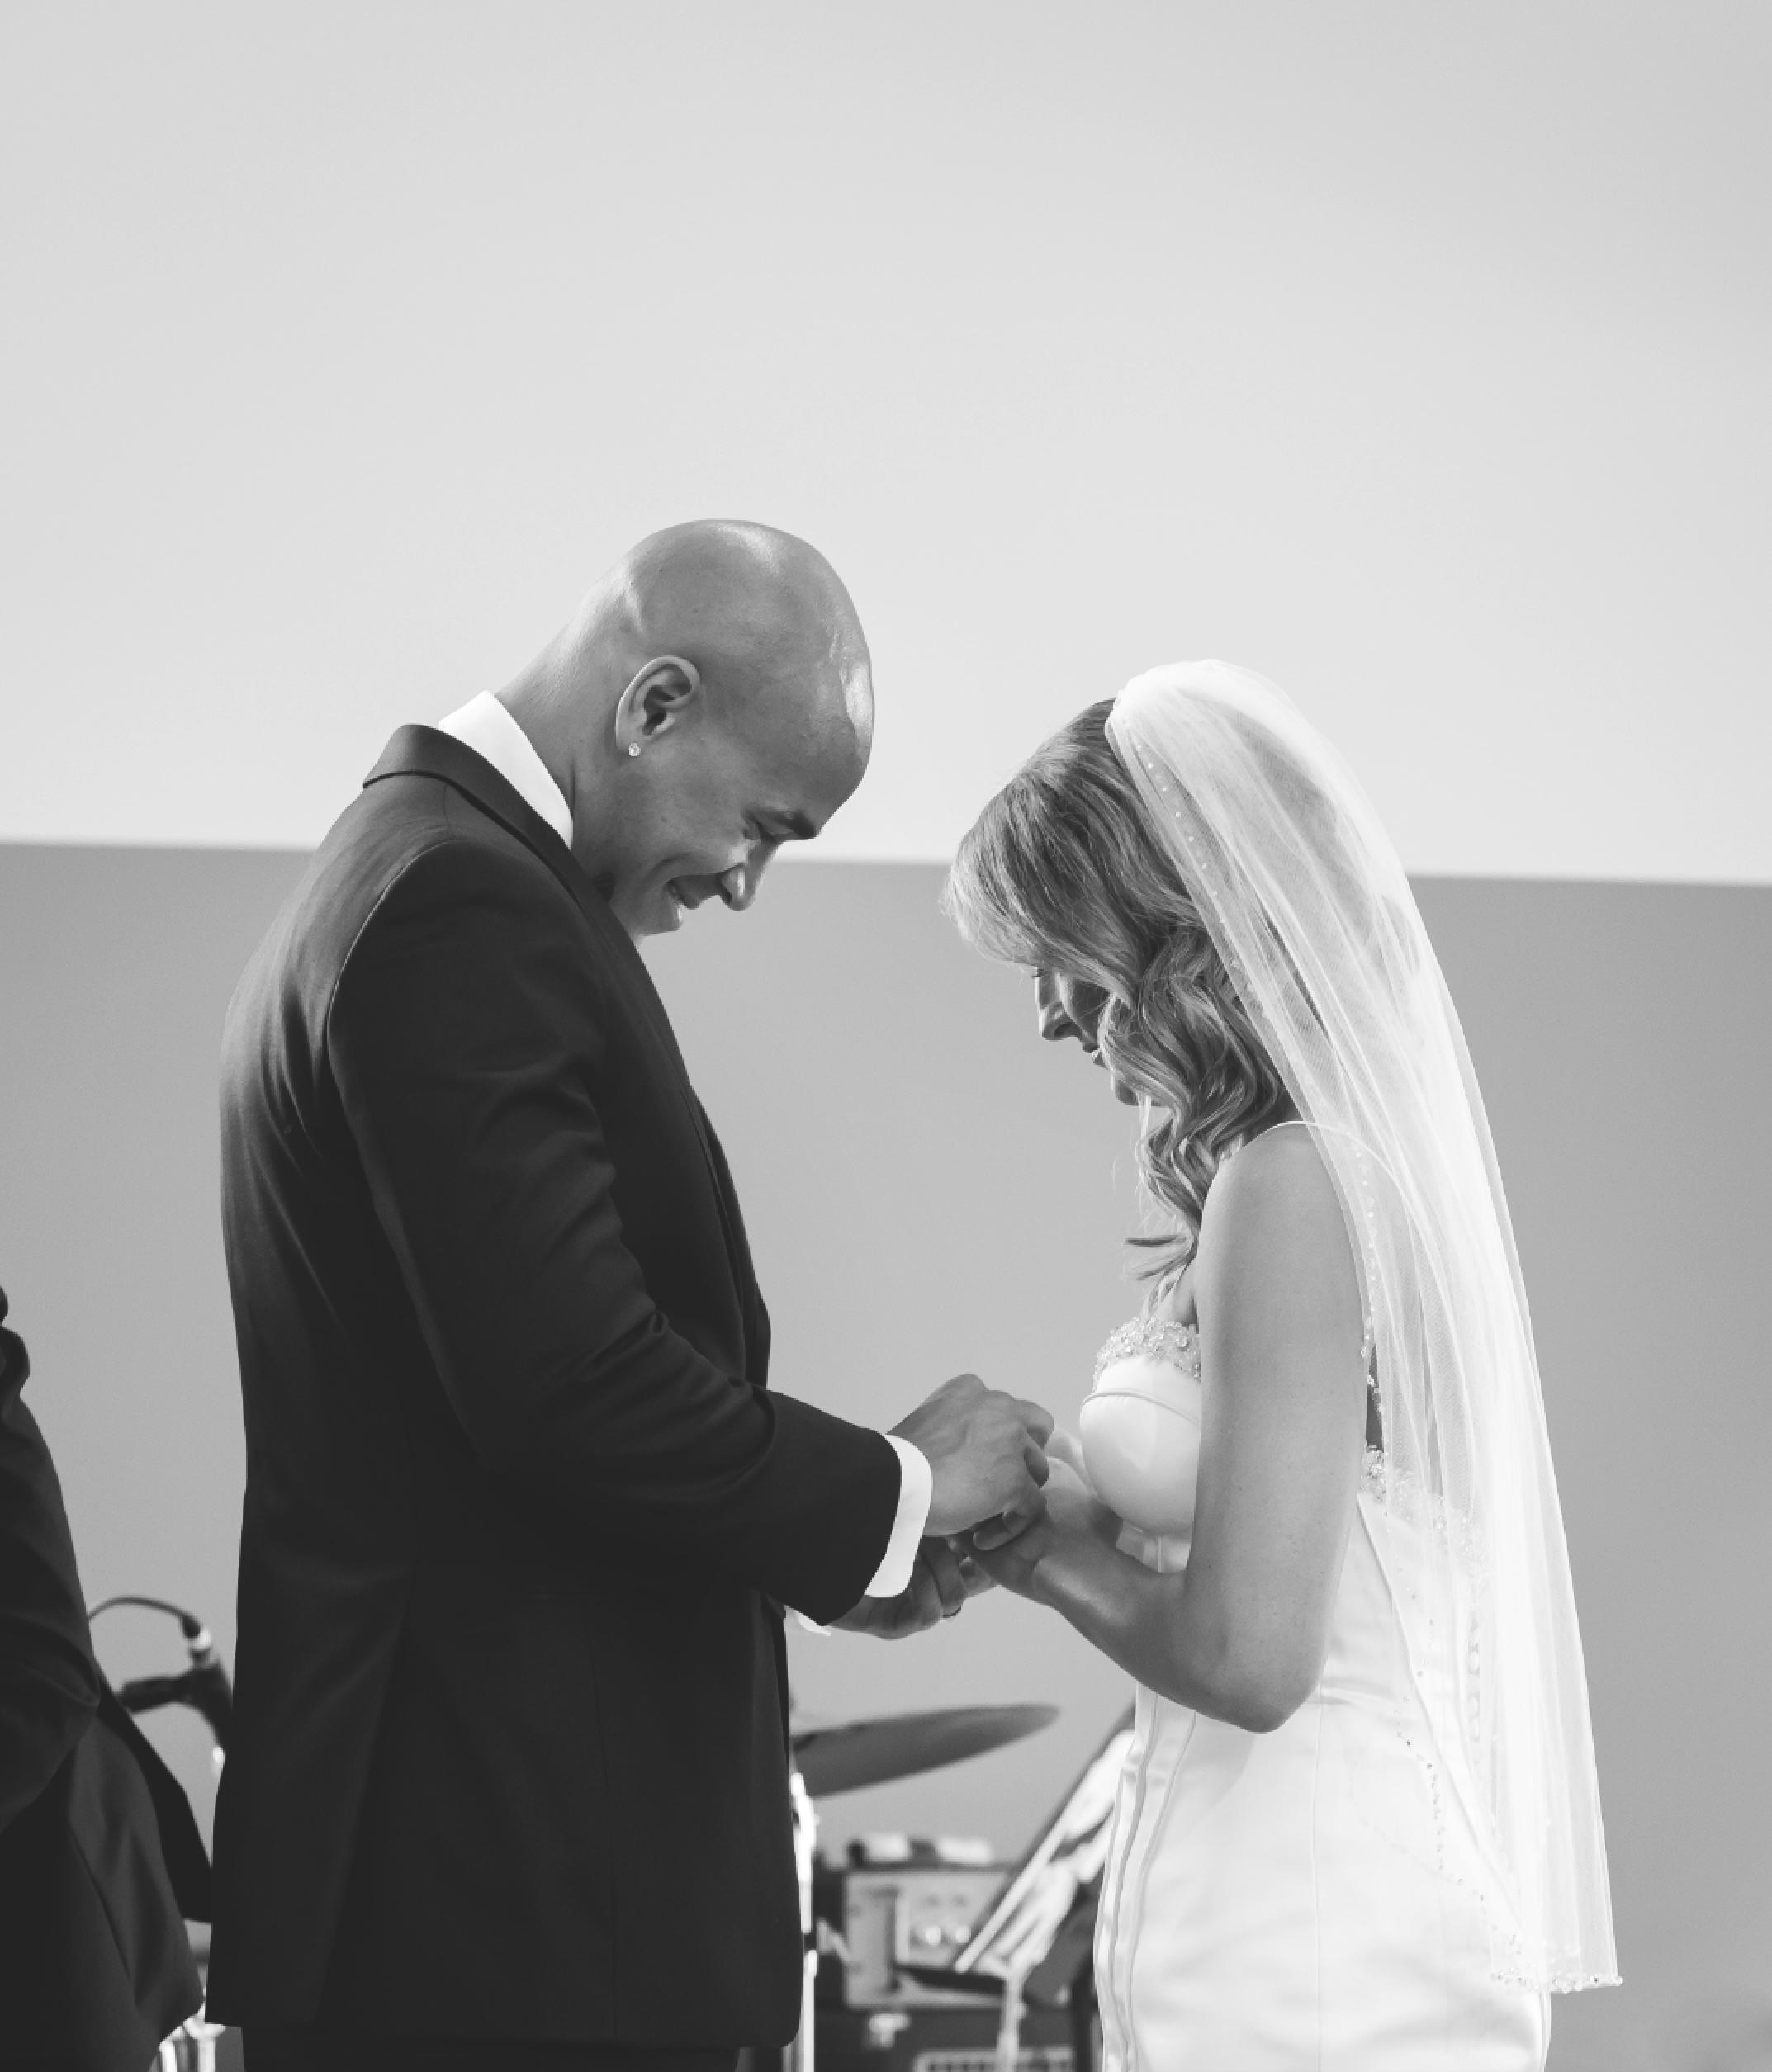 Wedding-Burlington-Convention-Center-Burlington-Oakville-Toronto-Hamilton-Niagara-Wedding-Photographer-Photography-Moments-by-Lauren-Photo-Image-24.png